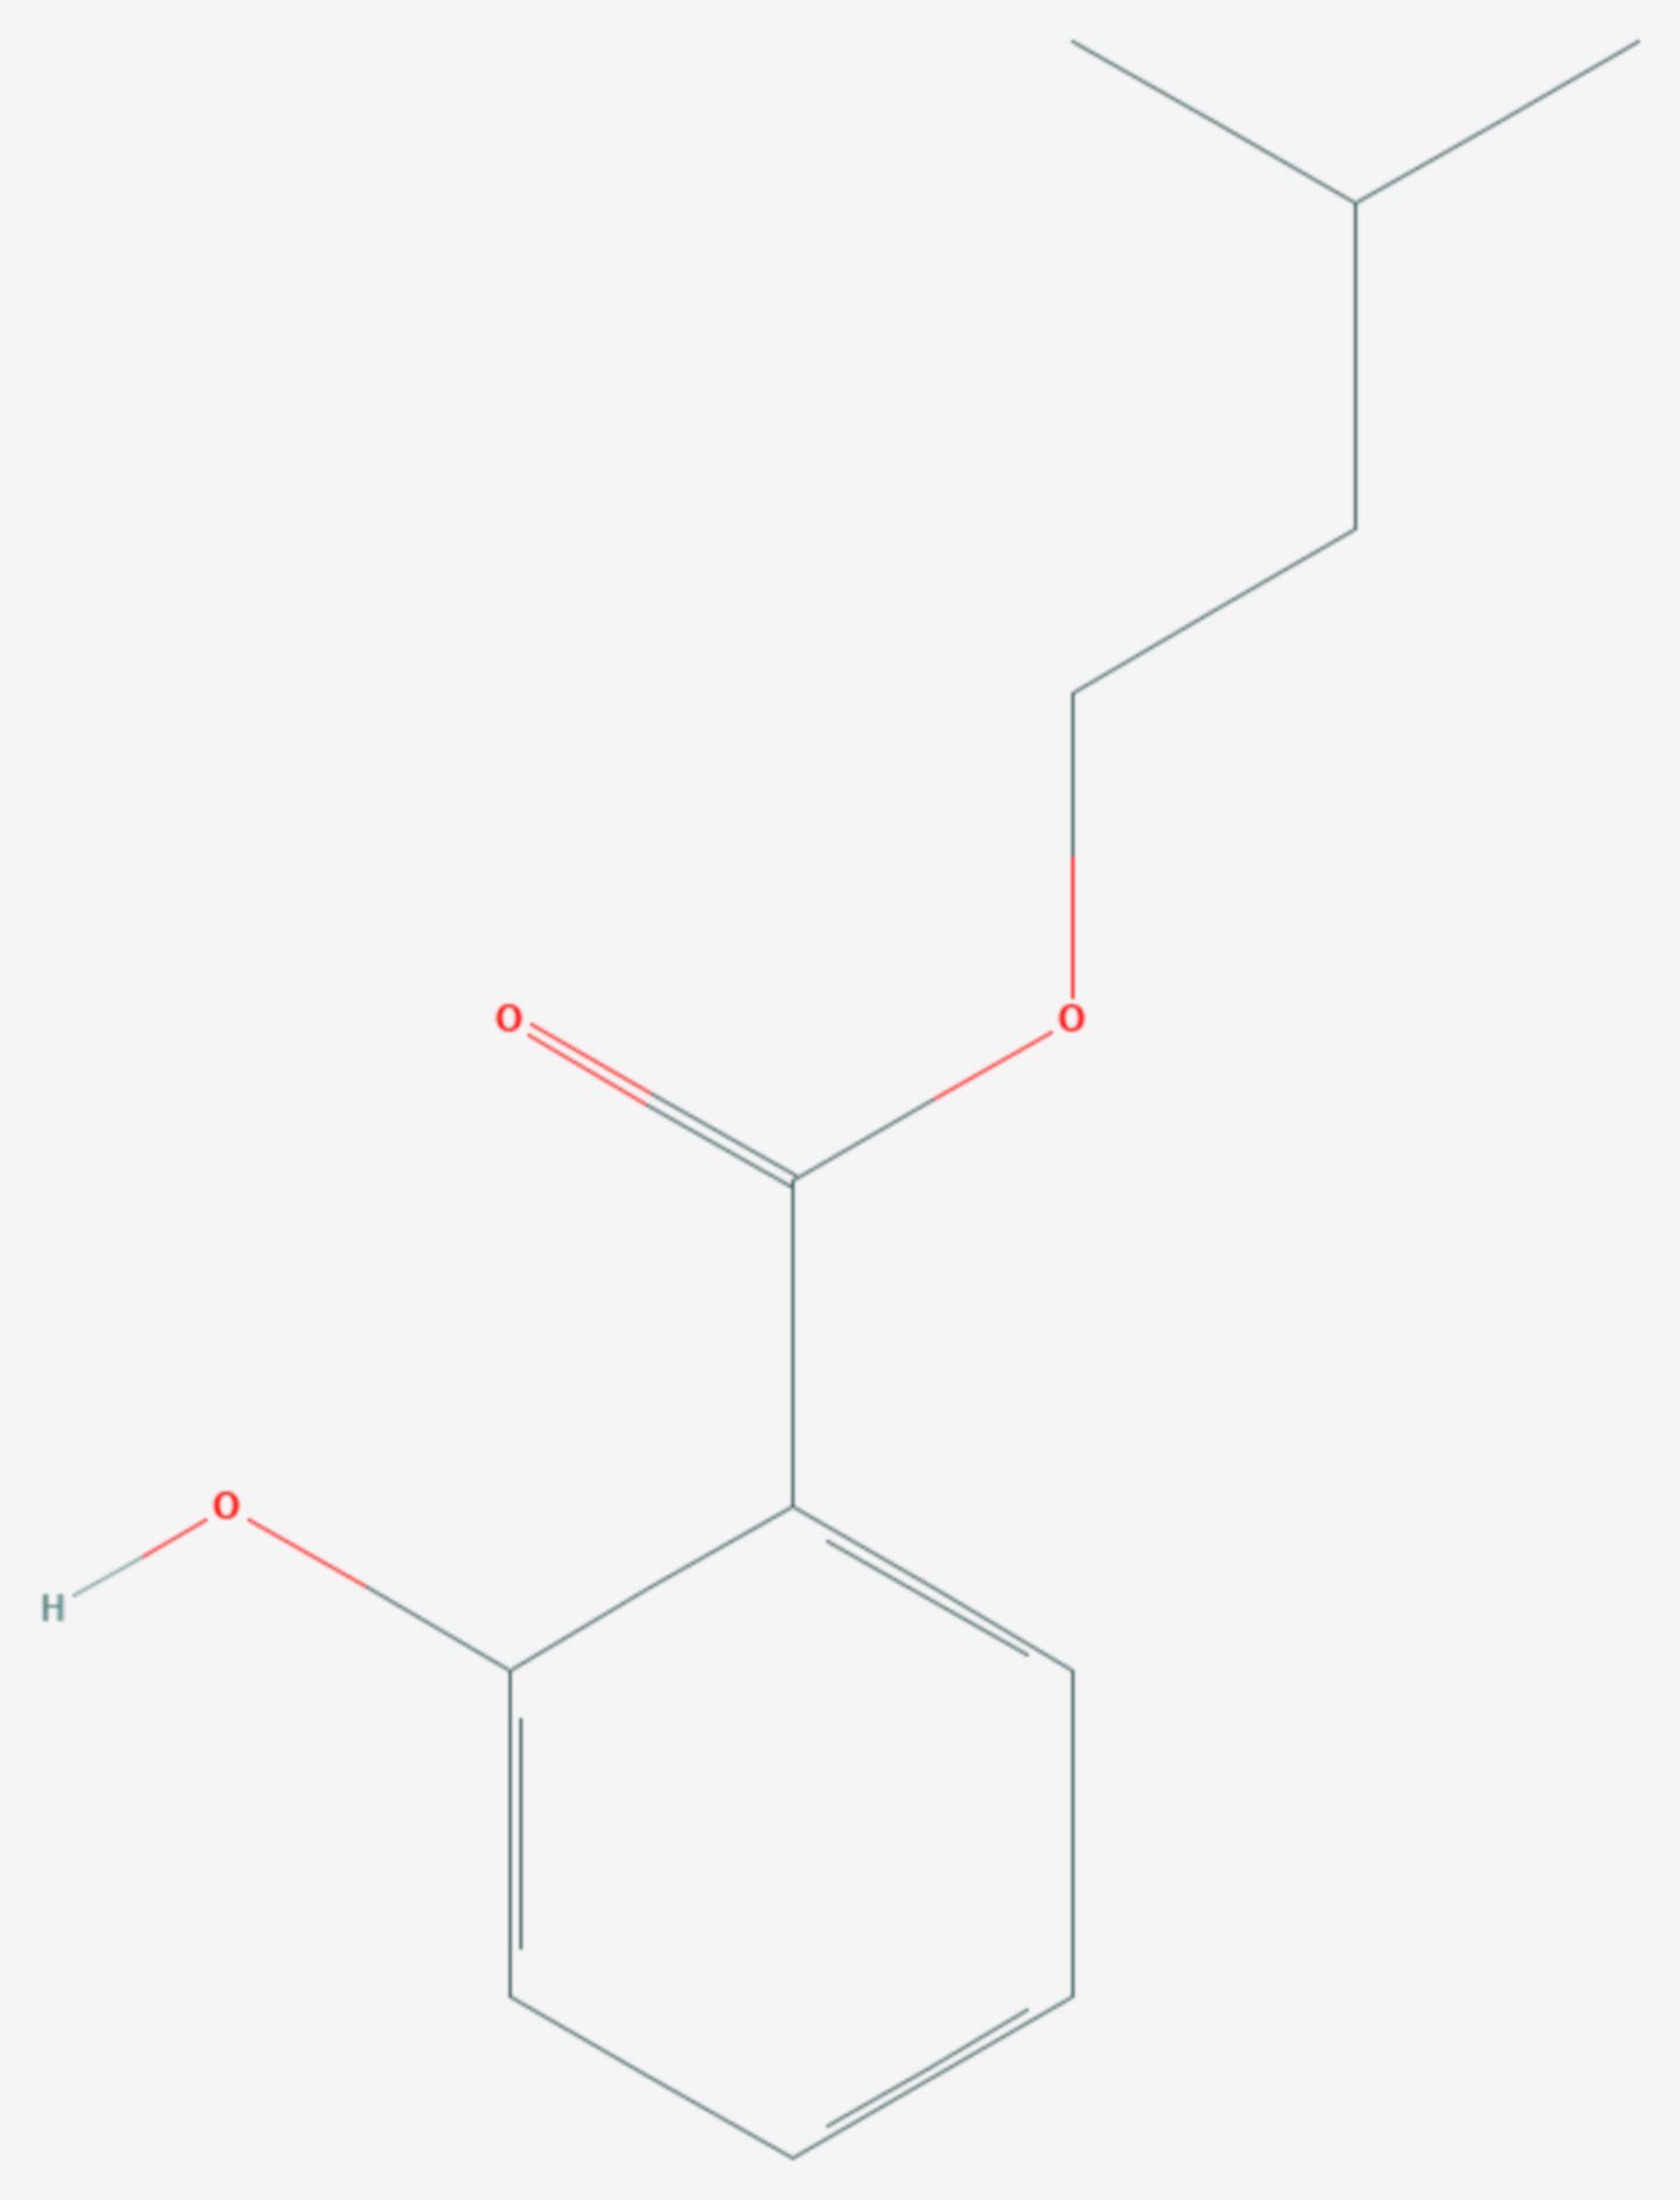 Salicylsäureisopentylester (Strukturformel)